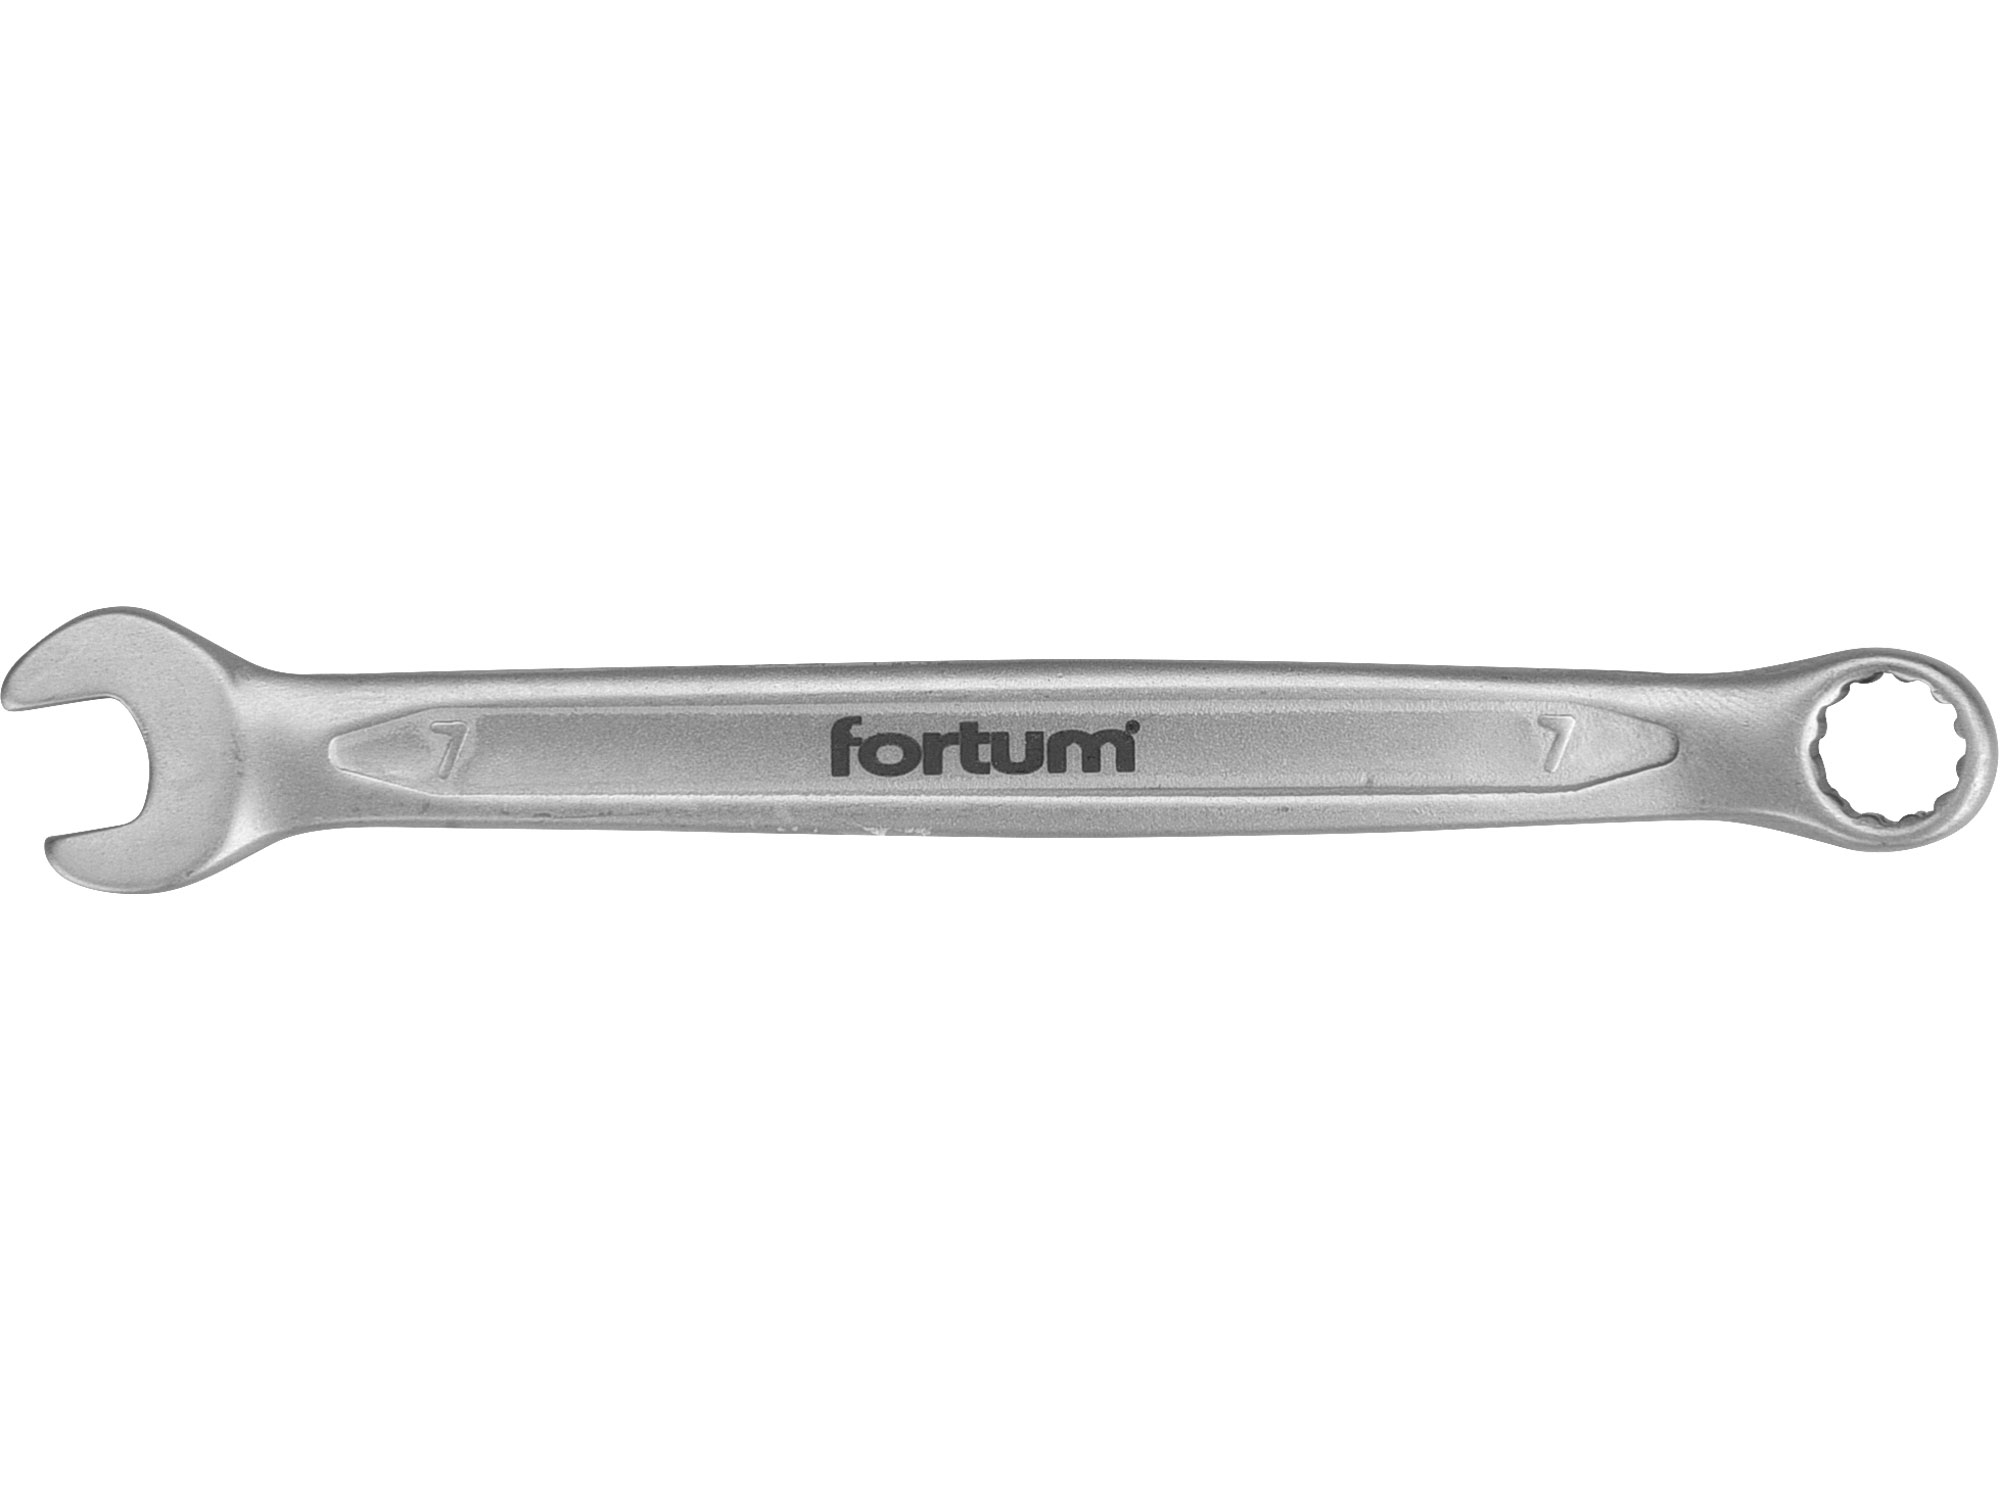 klíč očkoplochý, 7mm, L 121mm, FORTUM 4730207